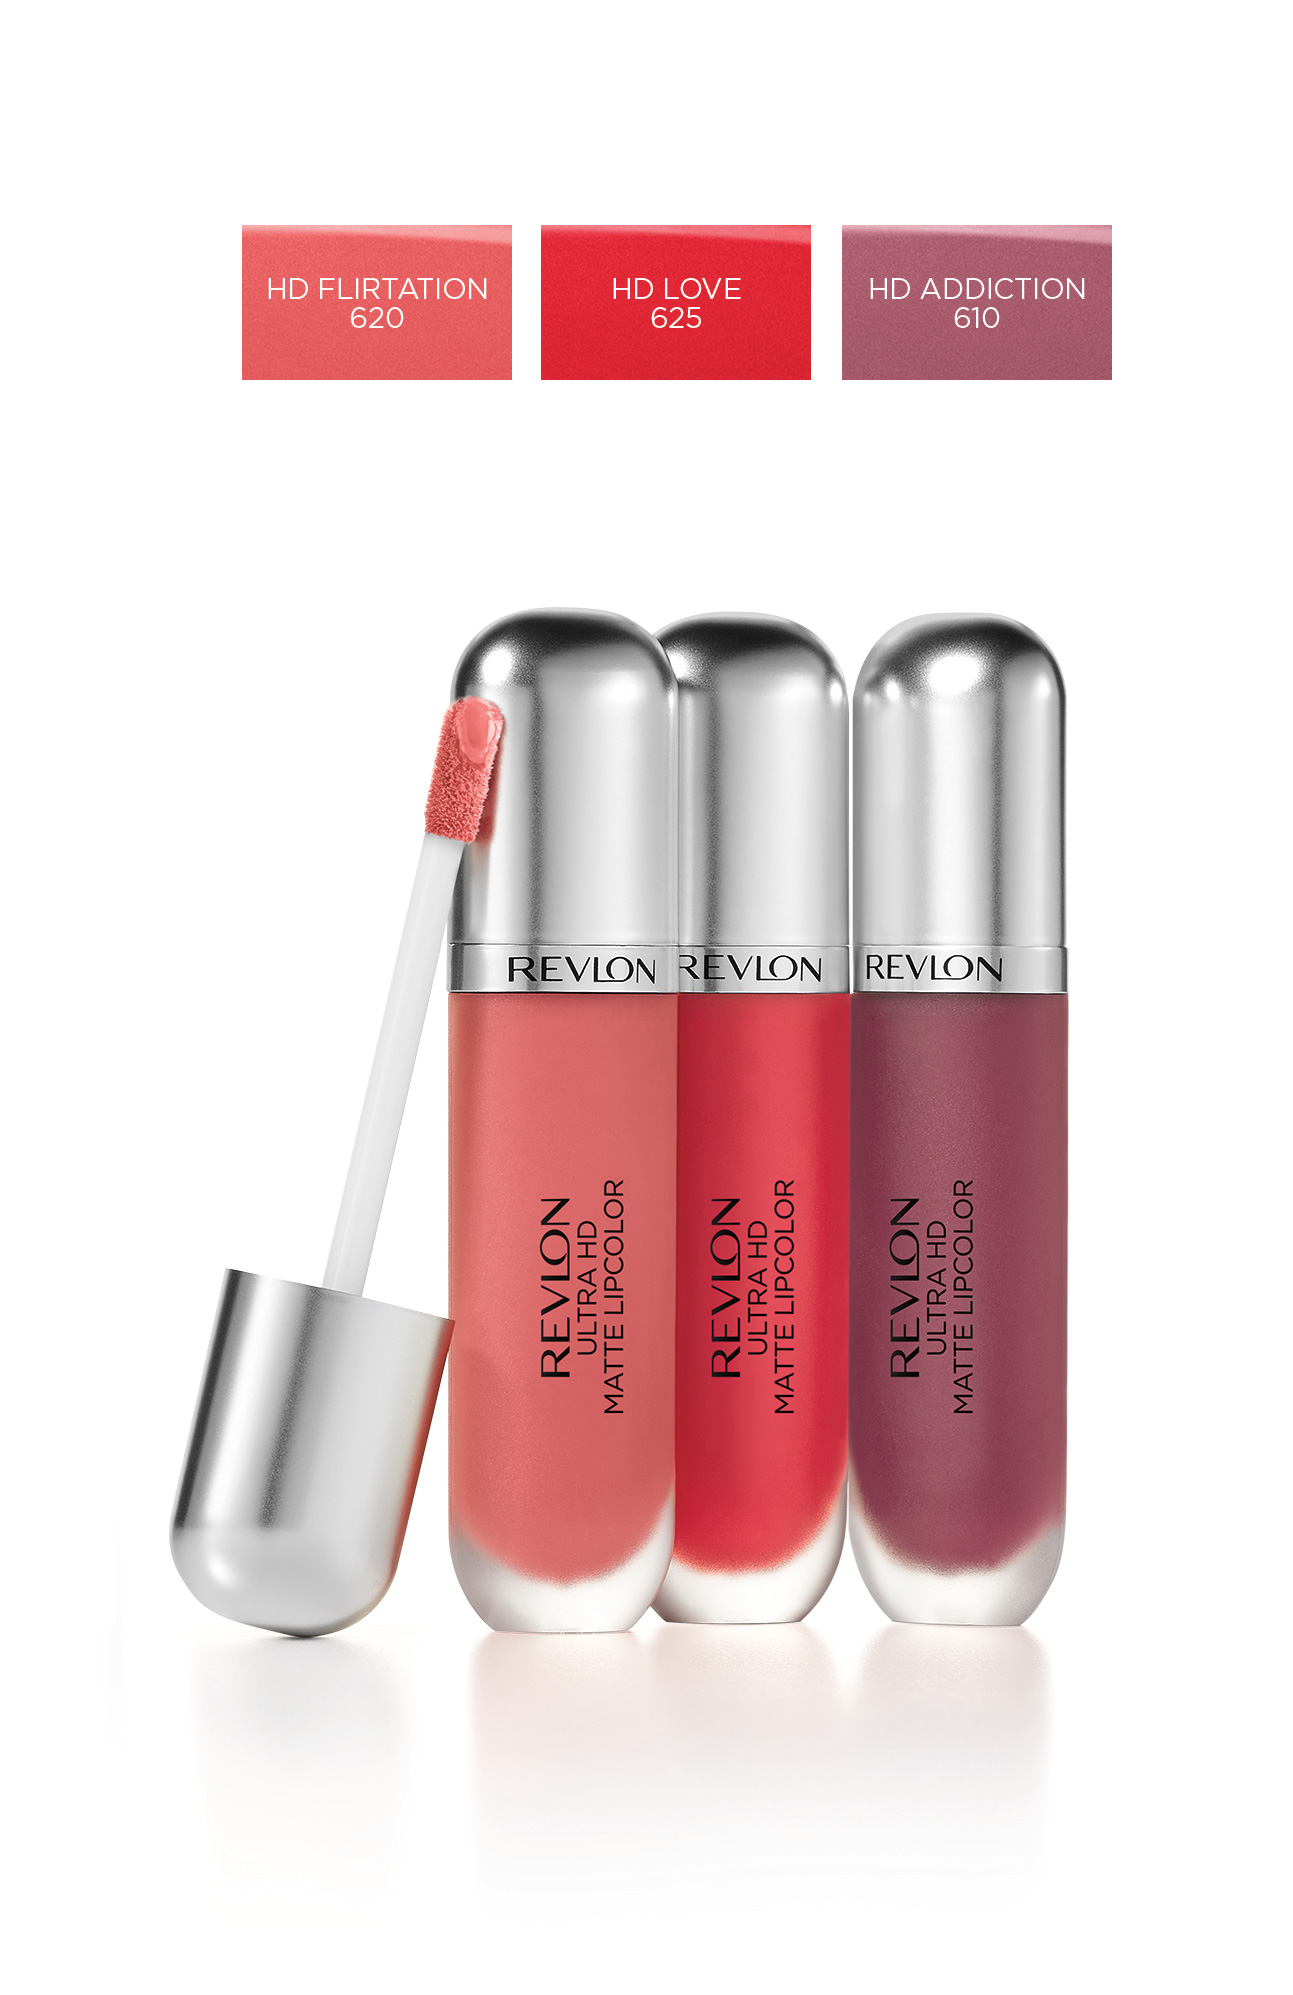 revlon_cosmetics_WRLC003401.jpg